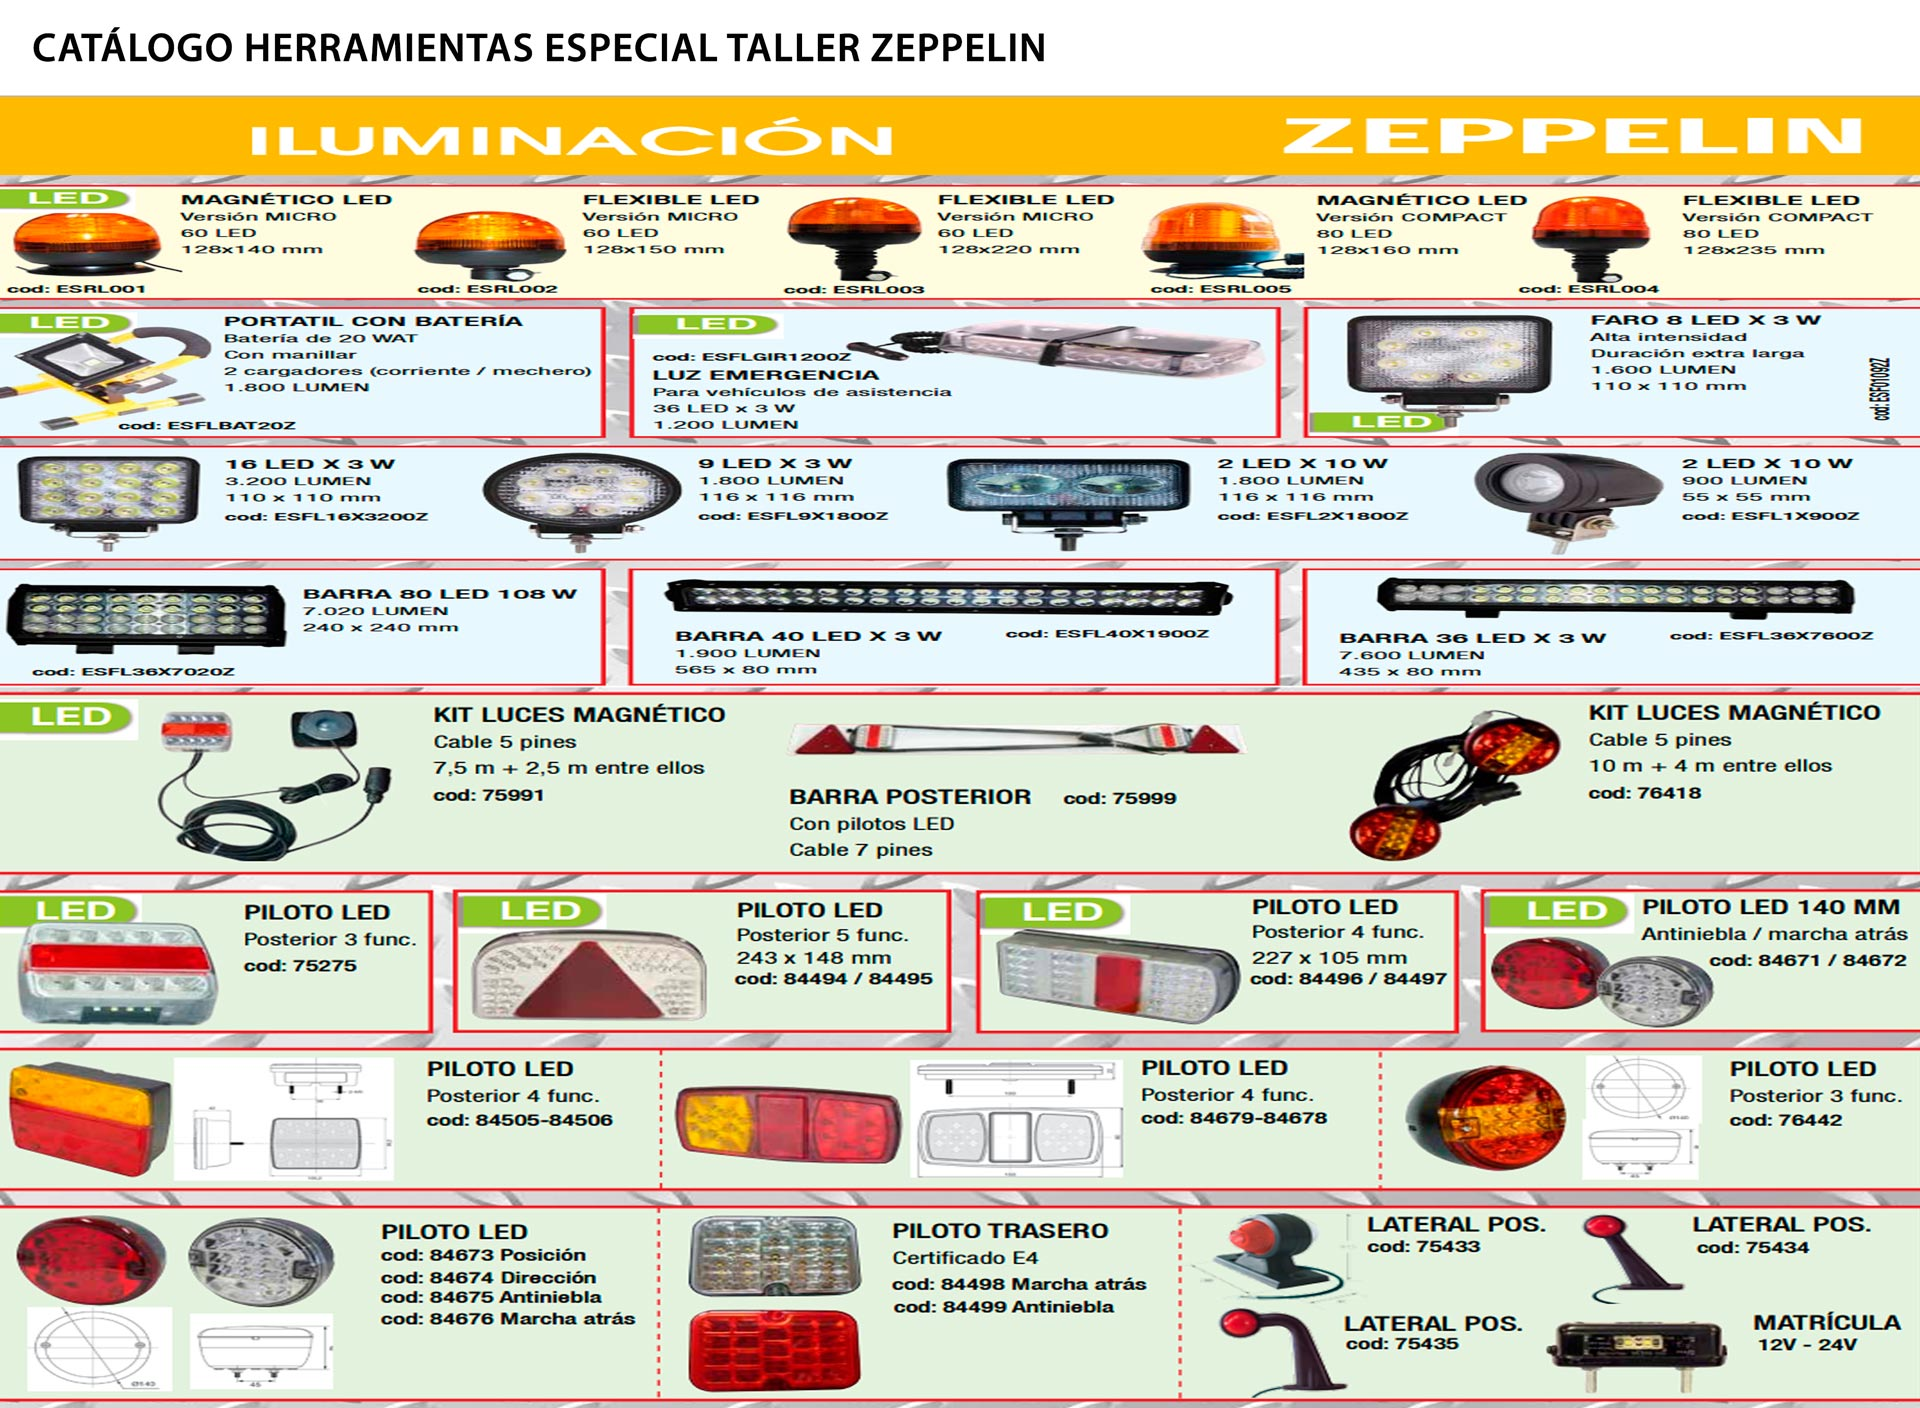 iluminacion.zepellin-1920